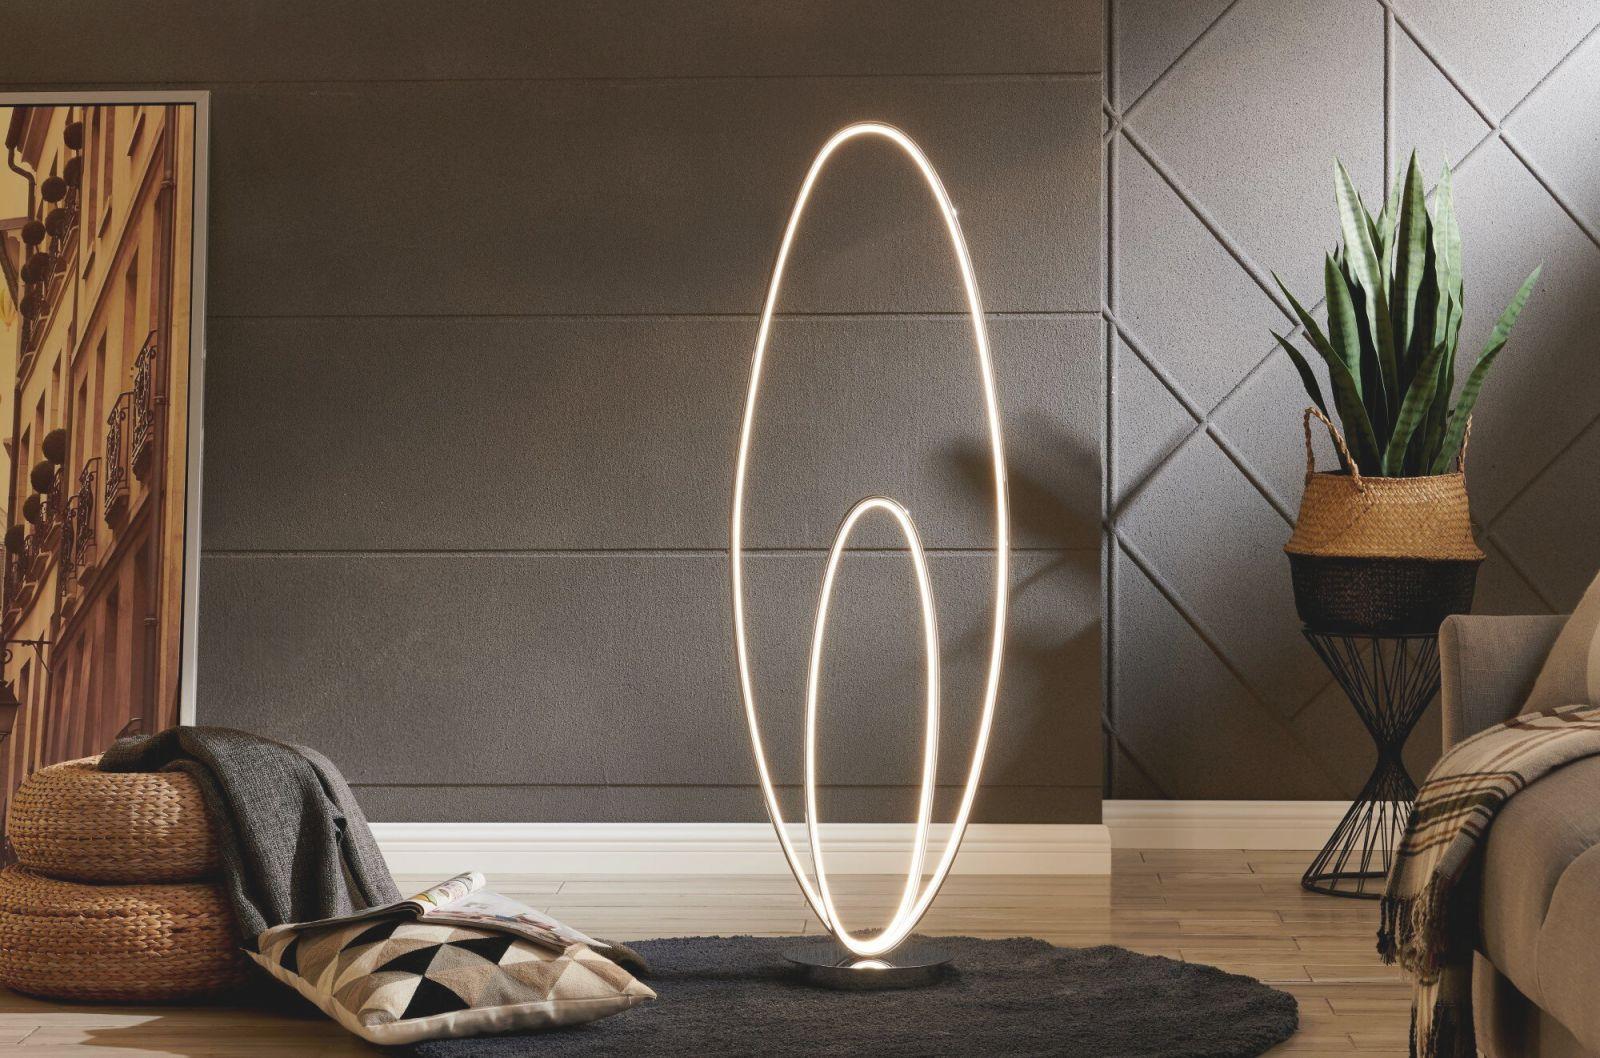 Carthage 126 Led Floor Lamp intended for Bright Floor Lamp For Living Room